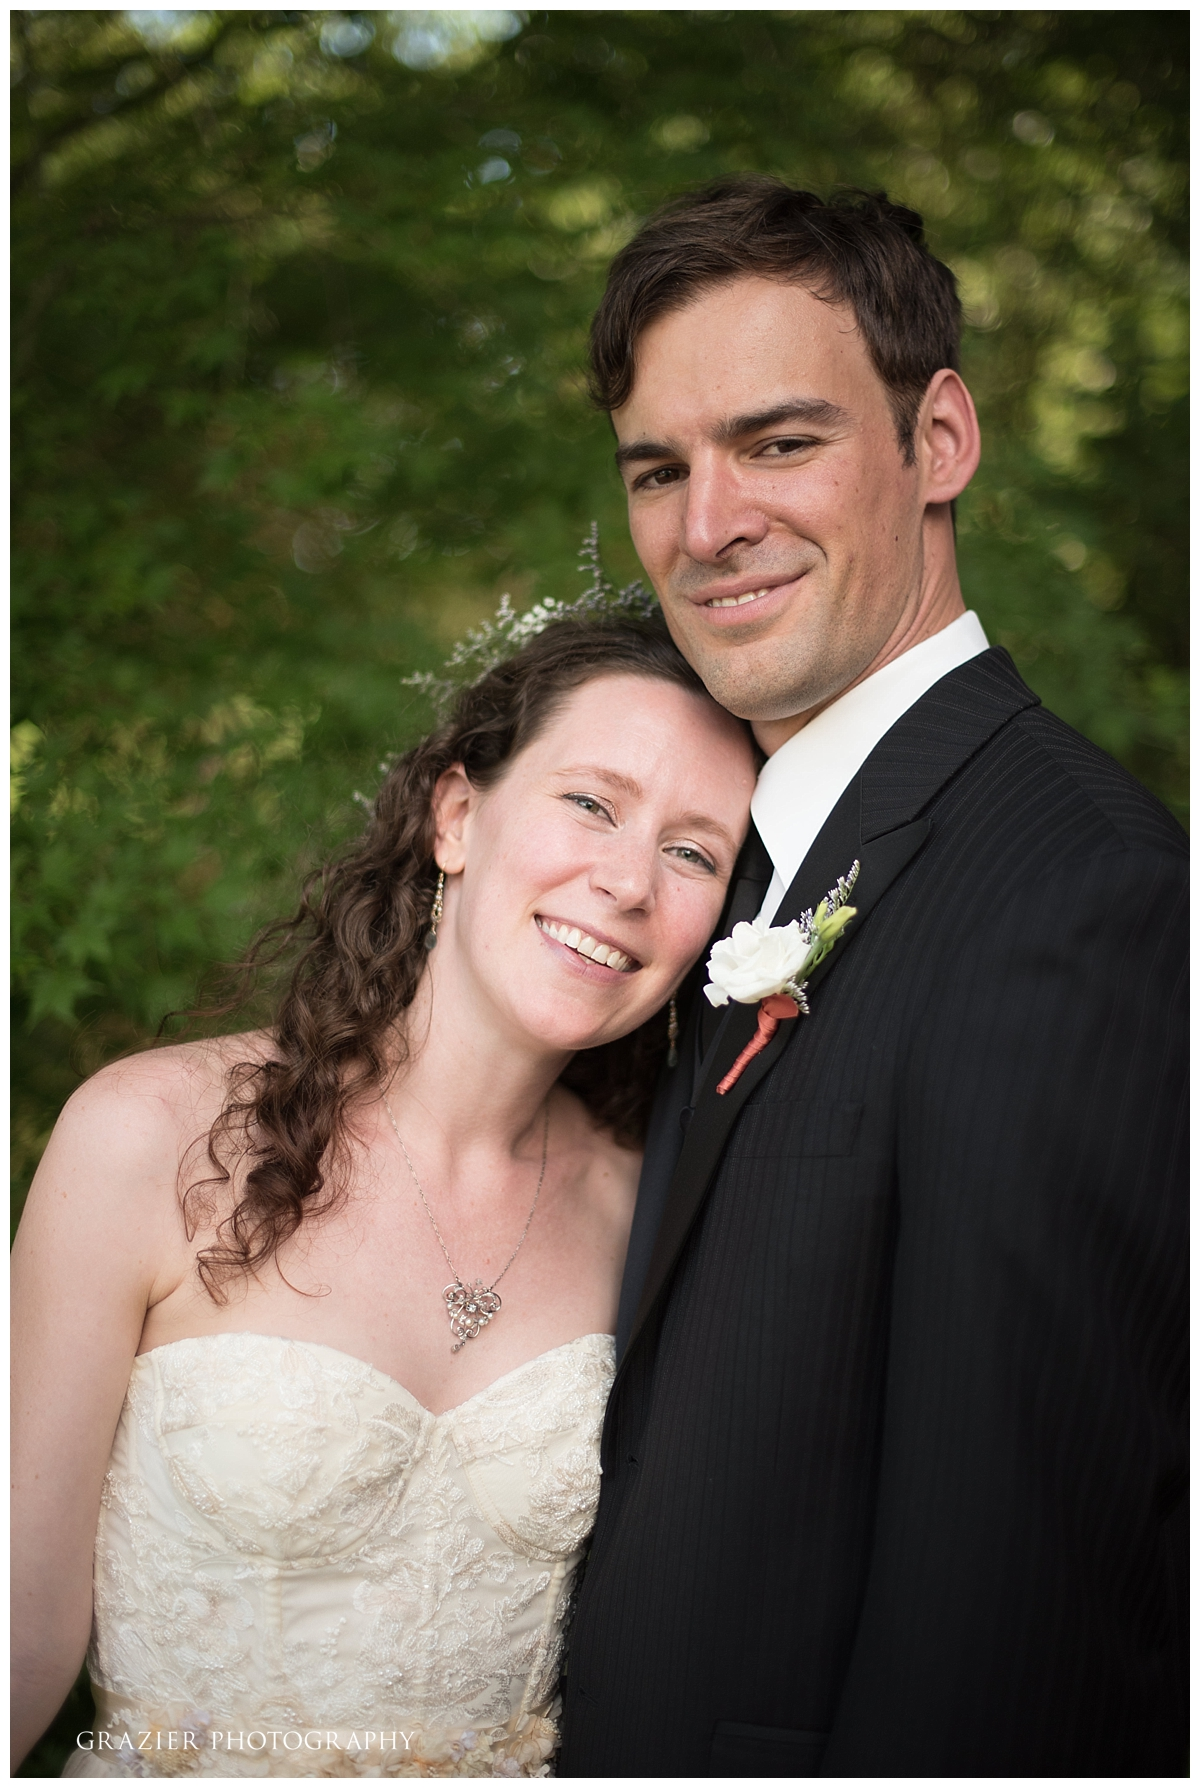 Tyrone Farm Wedding Grazier Photography 2017-40_WEB.jpg